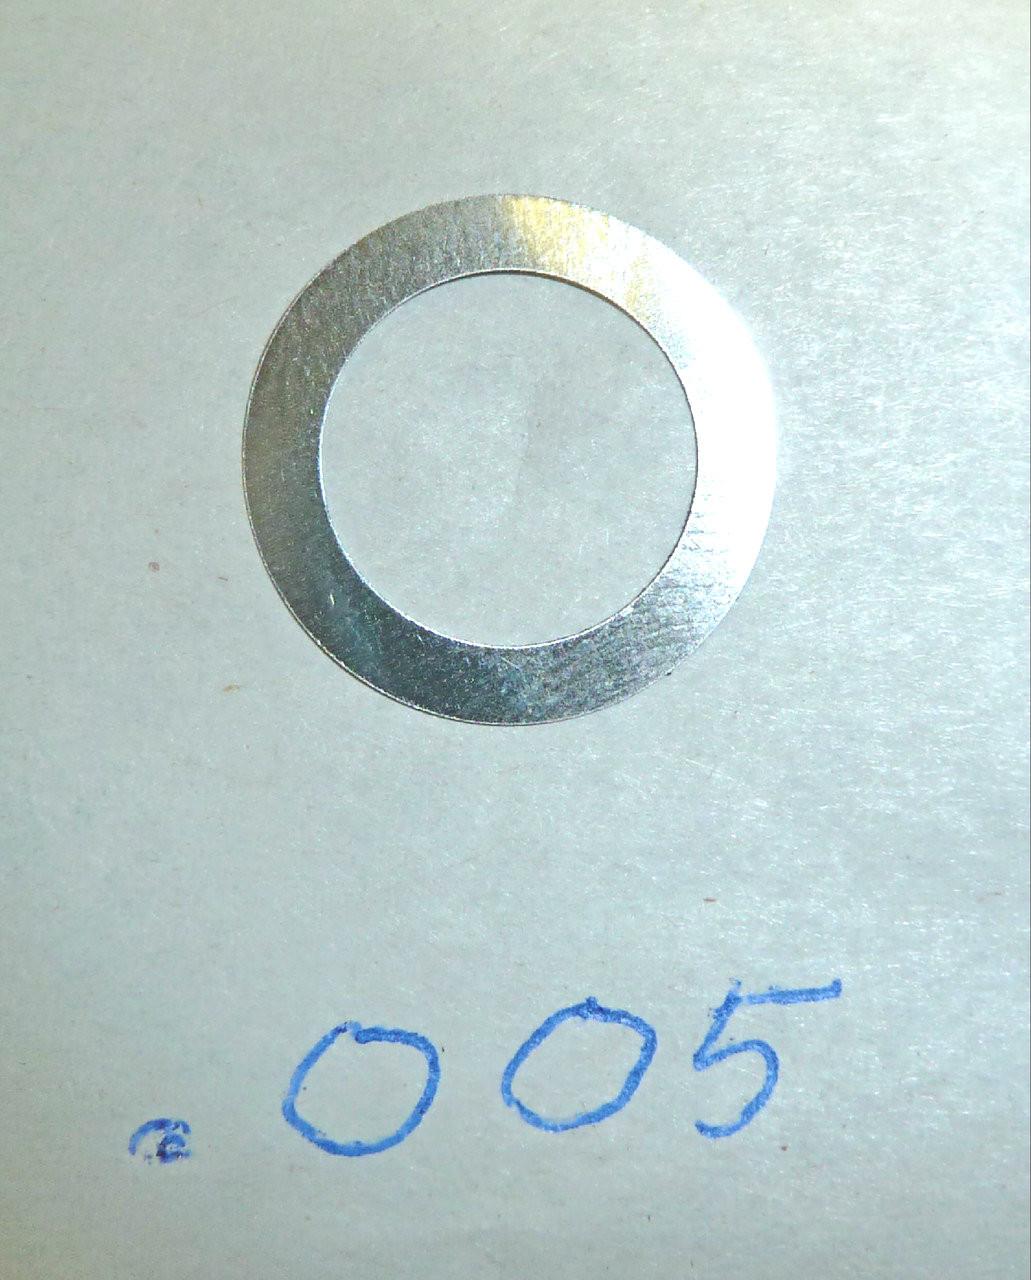 Vickers Lock Headspacing Washers No. 2 (repro), .005 Thickness